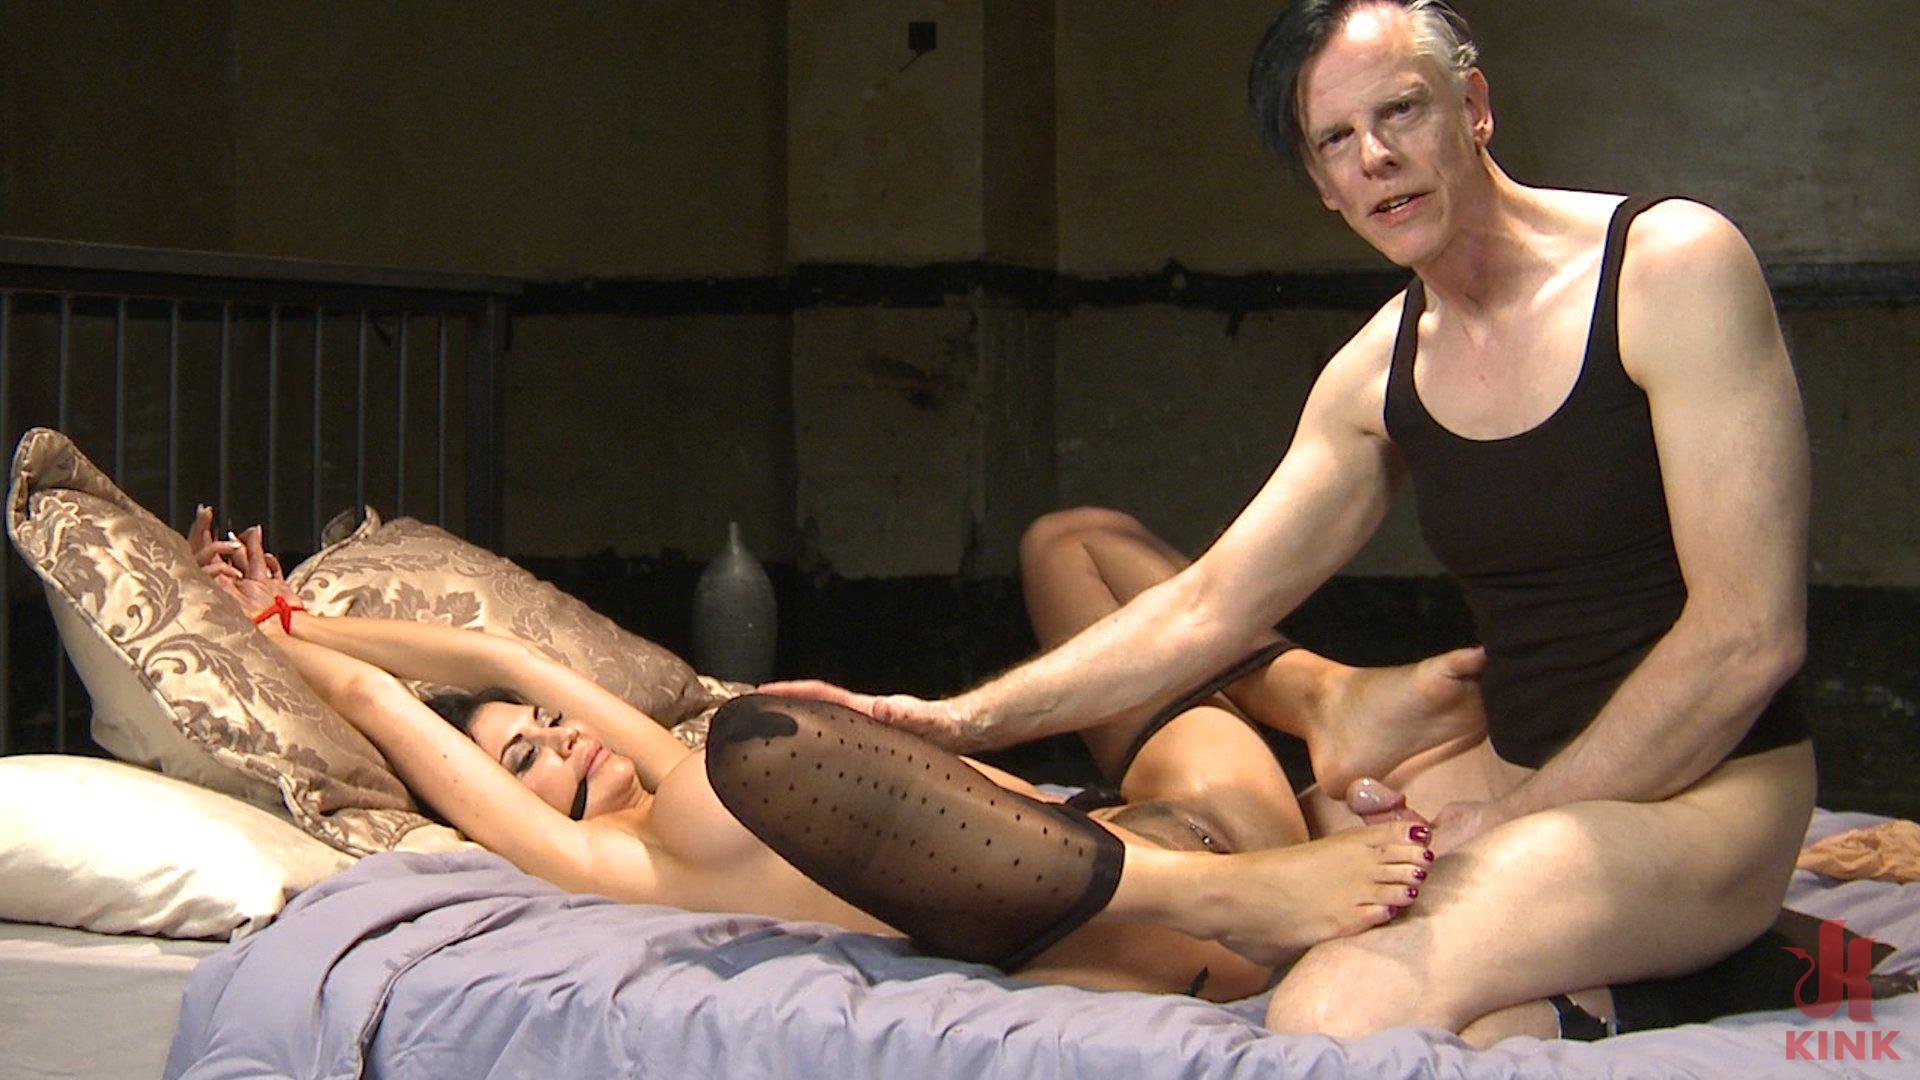 Photo number 9 from Sex Bondage with Stockings shot for Kink University on Kink.com. Featuring Jasmine Jae and Danarama in hardcore BDSM & Fetish porn.